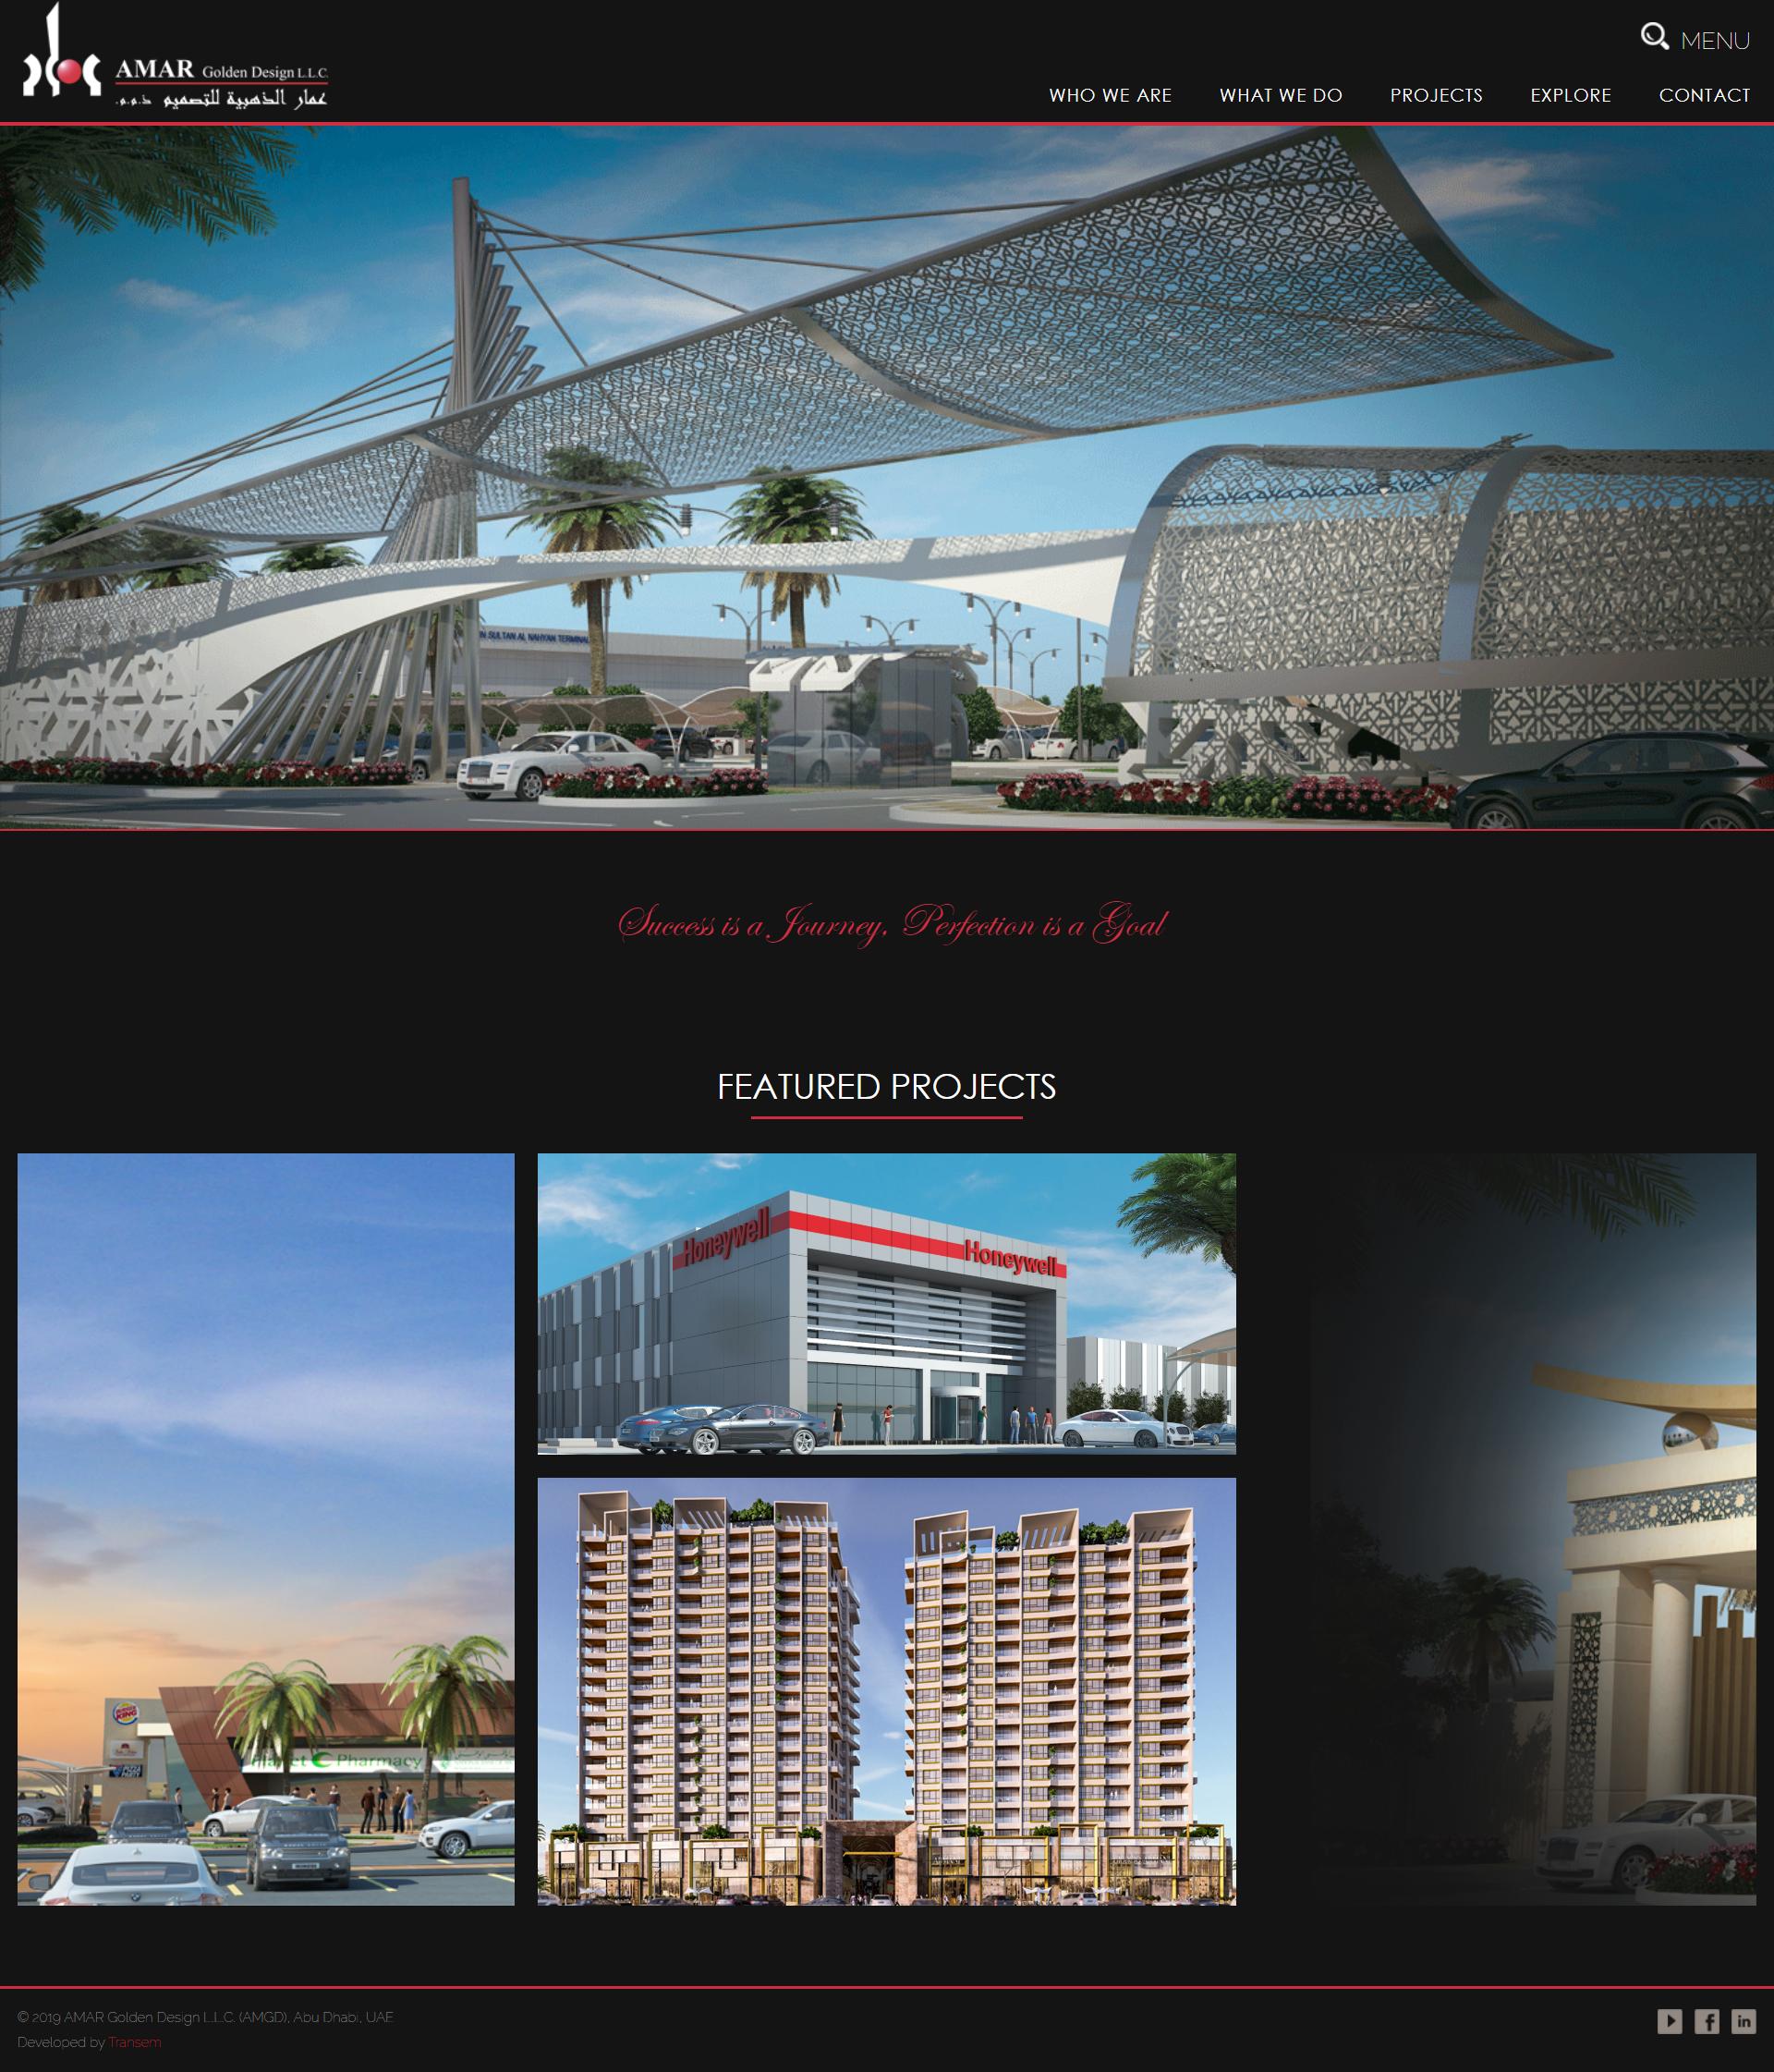 AMAR Golden Design LLC launches new web site